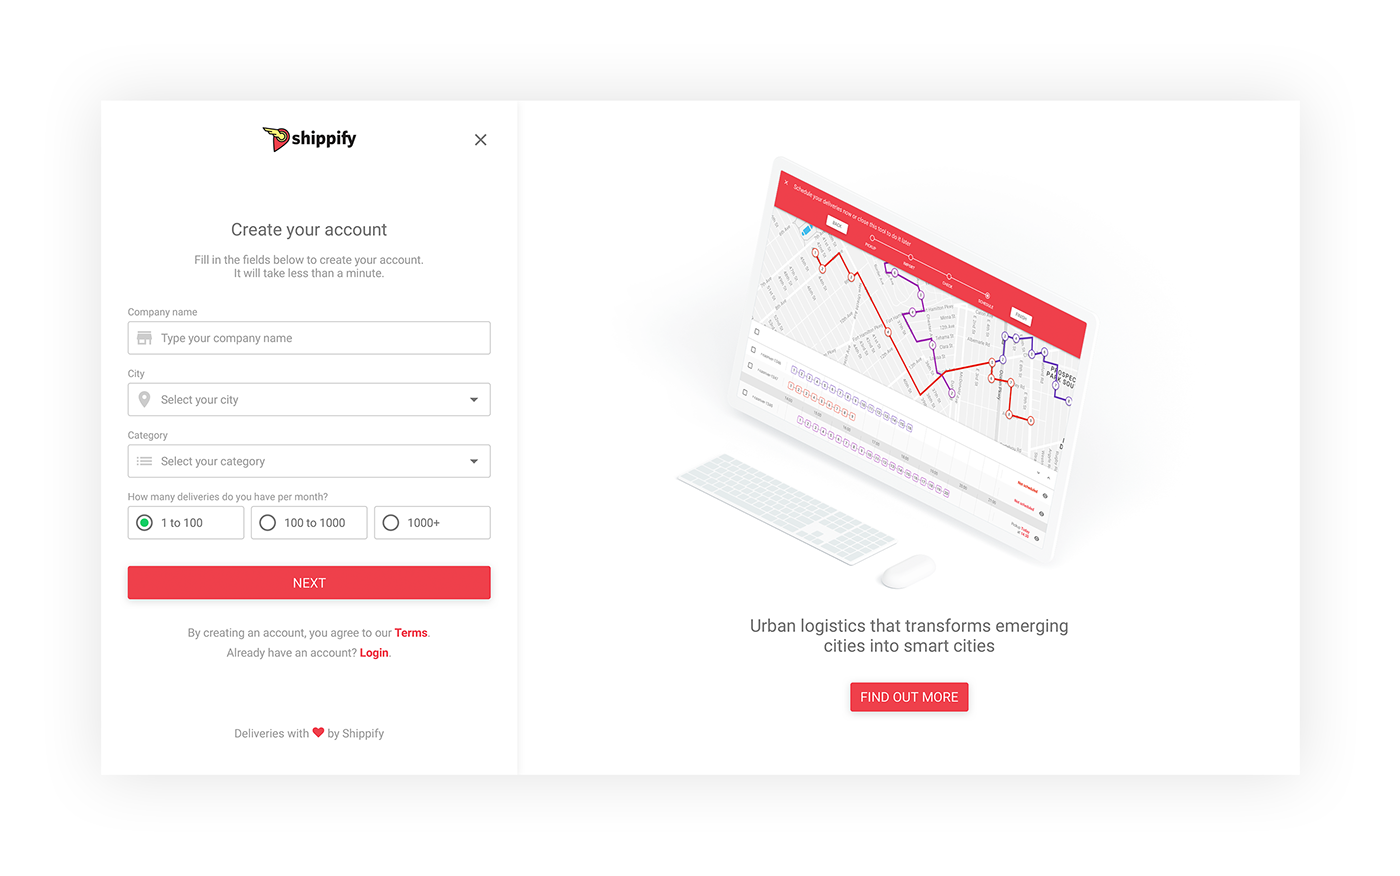 Adobe Portfolio shippify dashboard UI ux interface design user experience design system